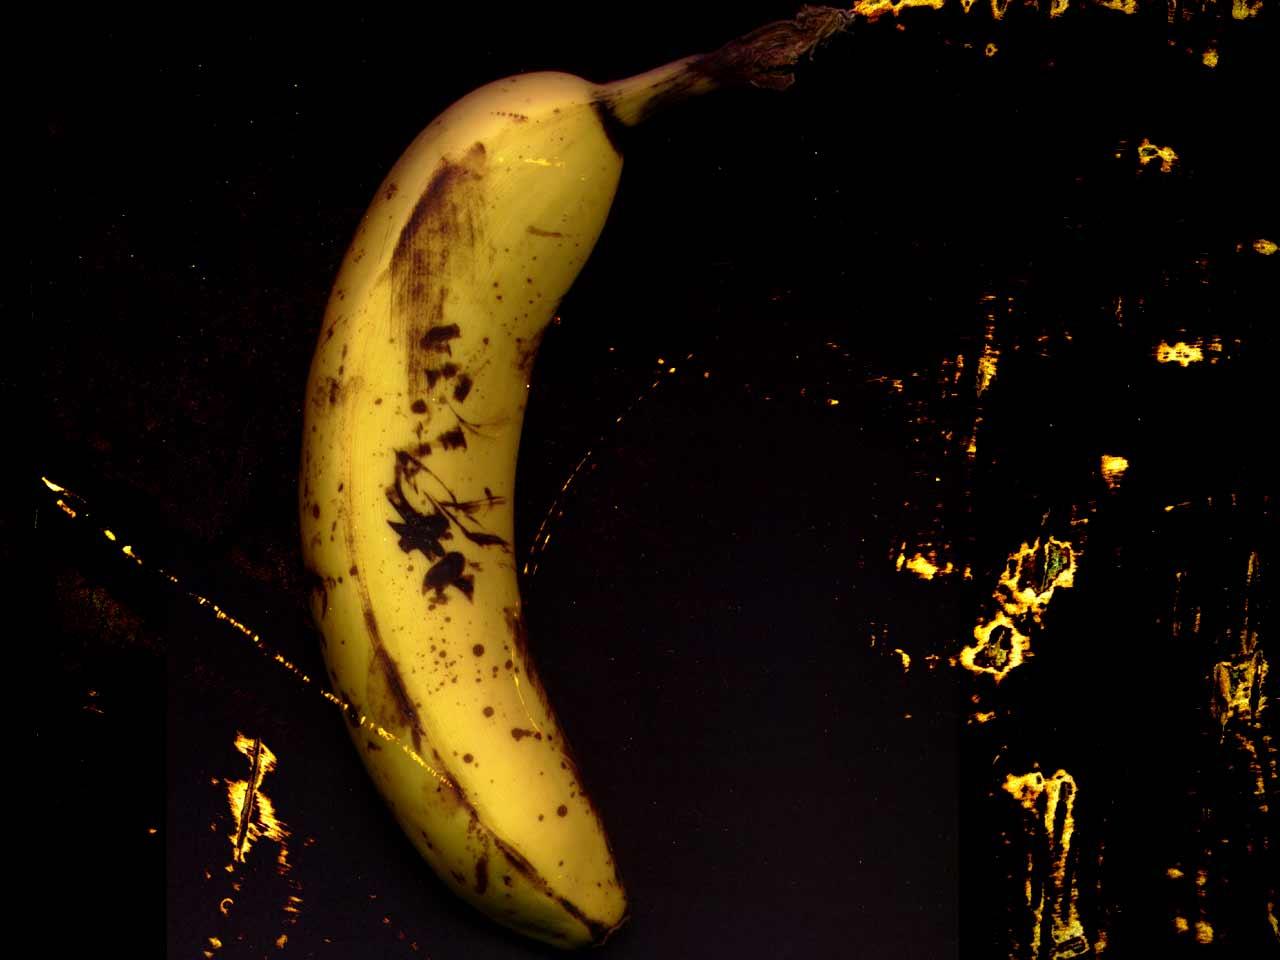 Toyota Land Cruiser Hd Wallpaper صور موز خلفيات فاكهة الموز Hd ميكساتك